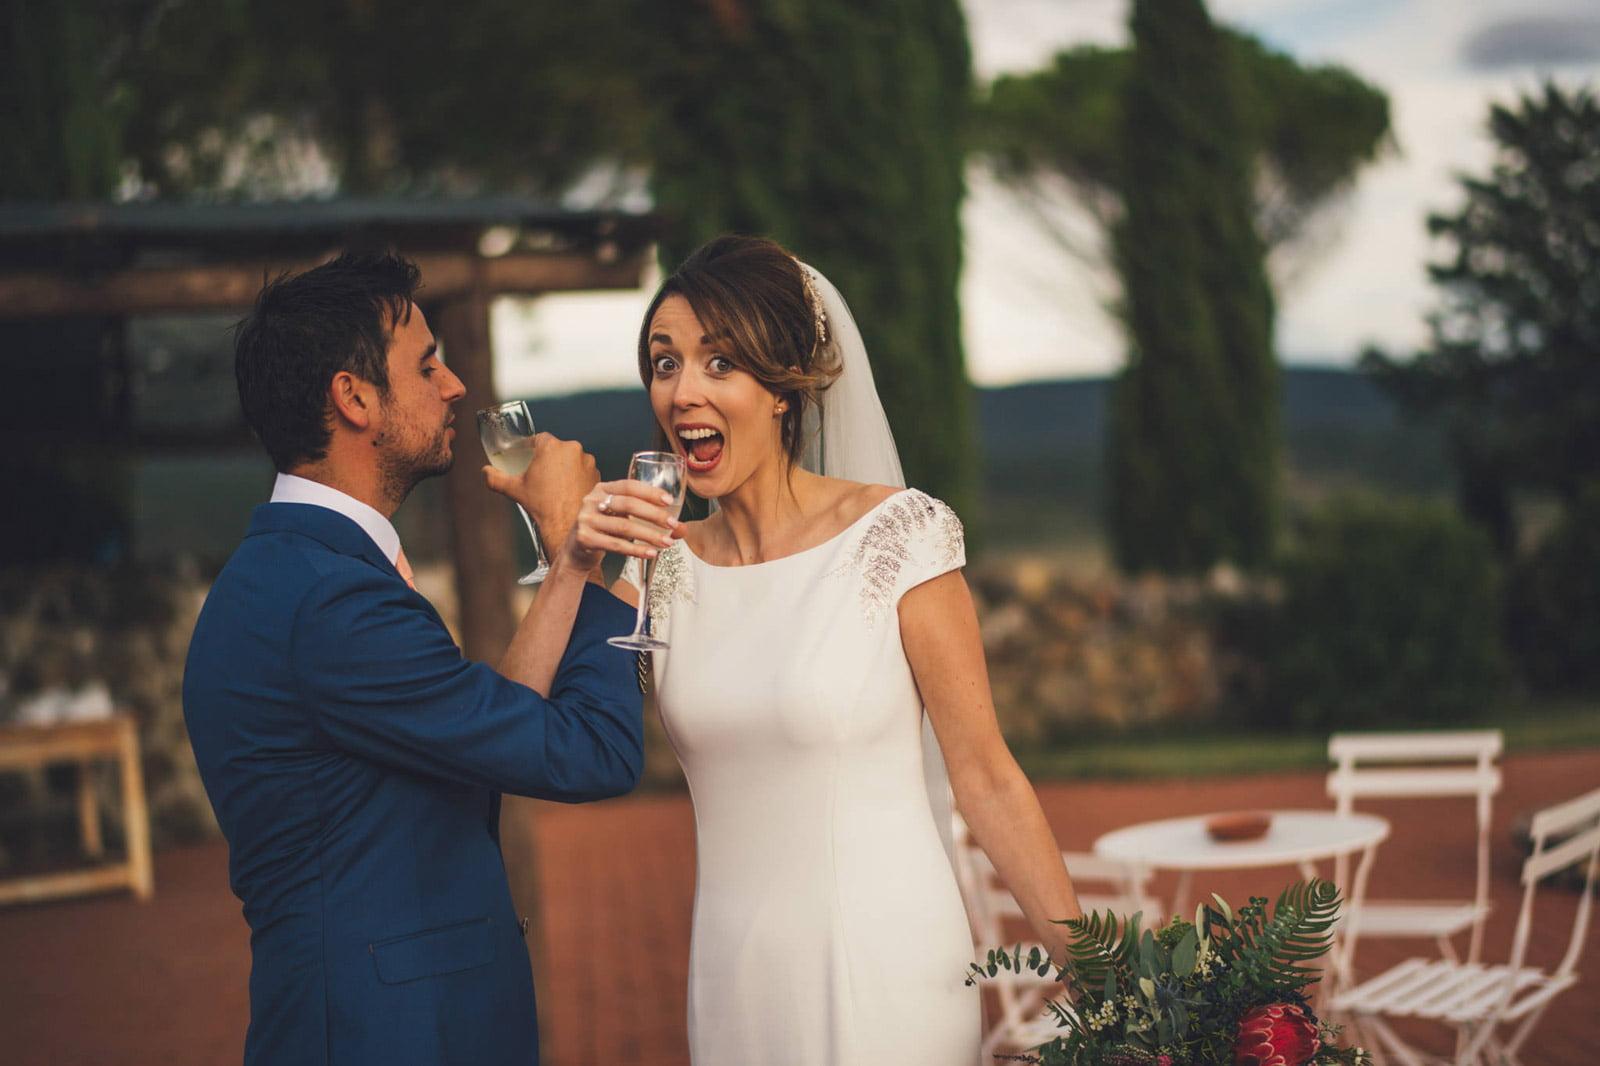 068-wedding-tuscany-san-galgano-federico-pannacci-photographer